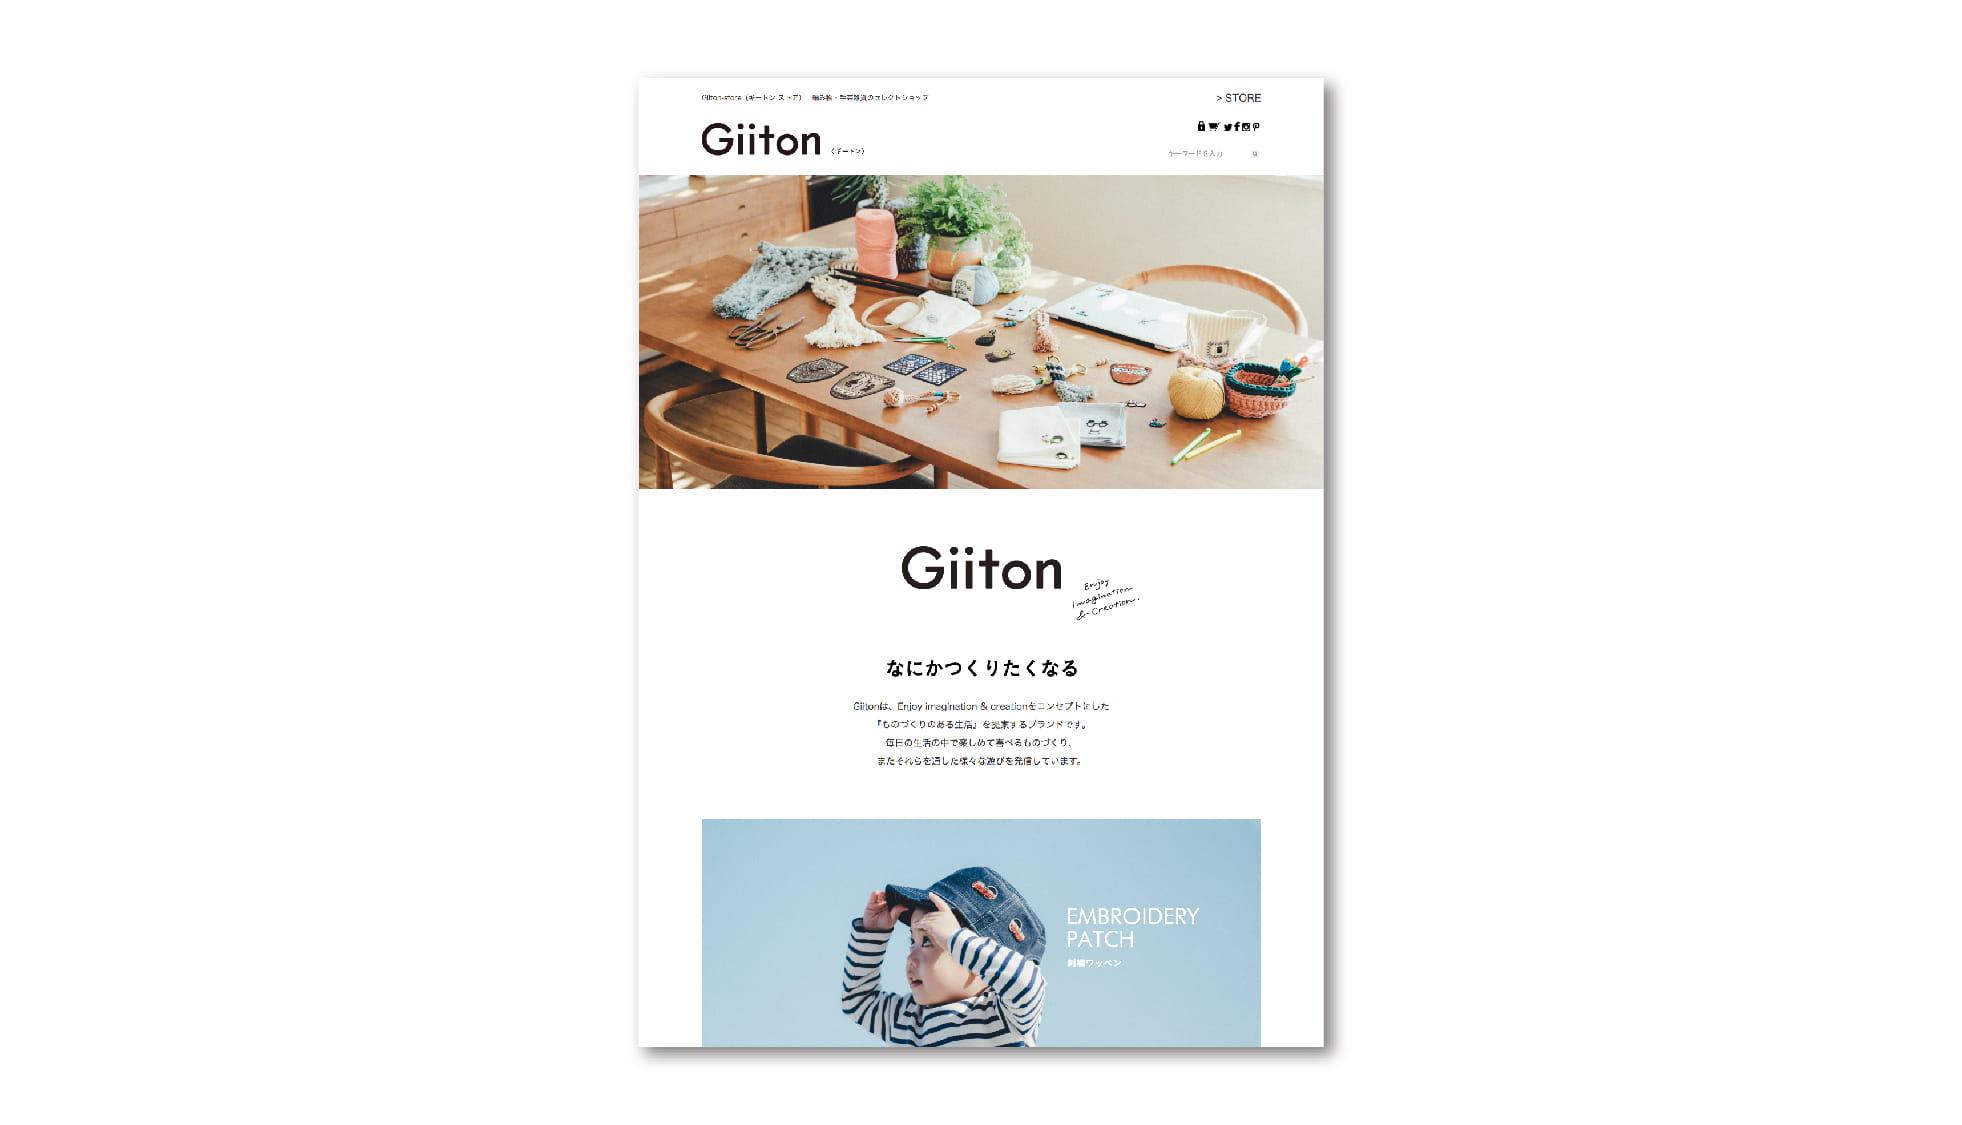 Giiton